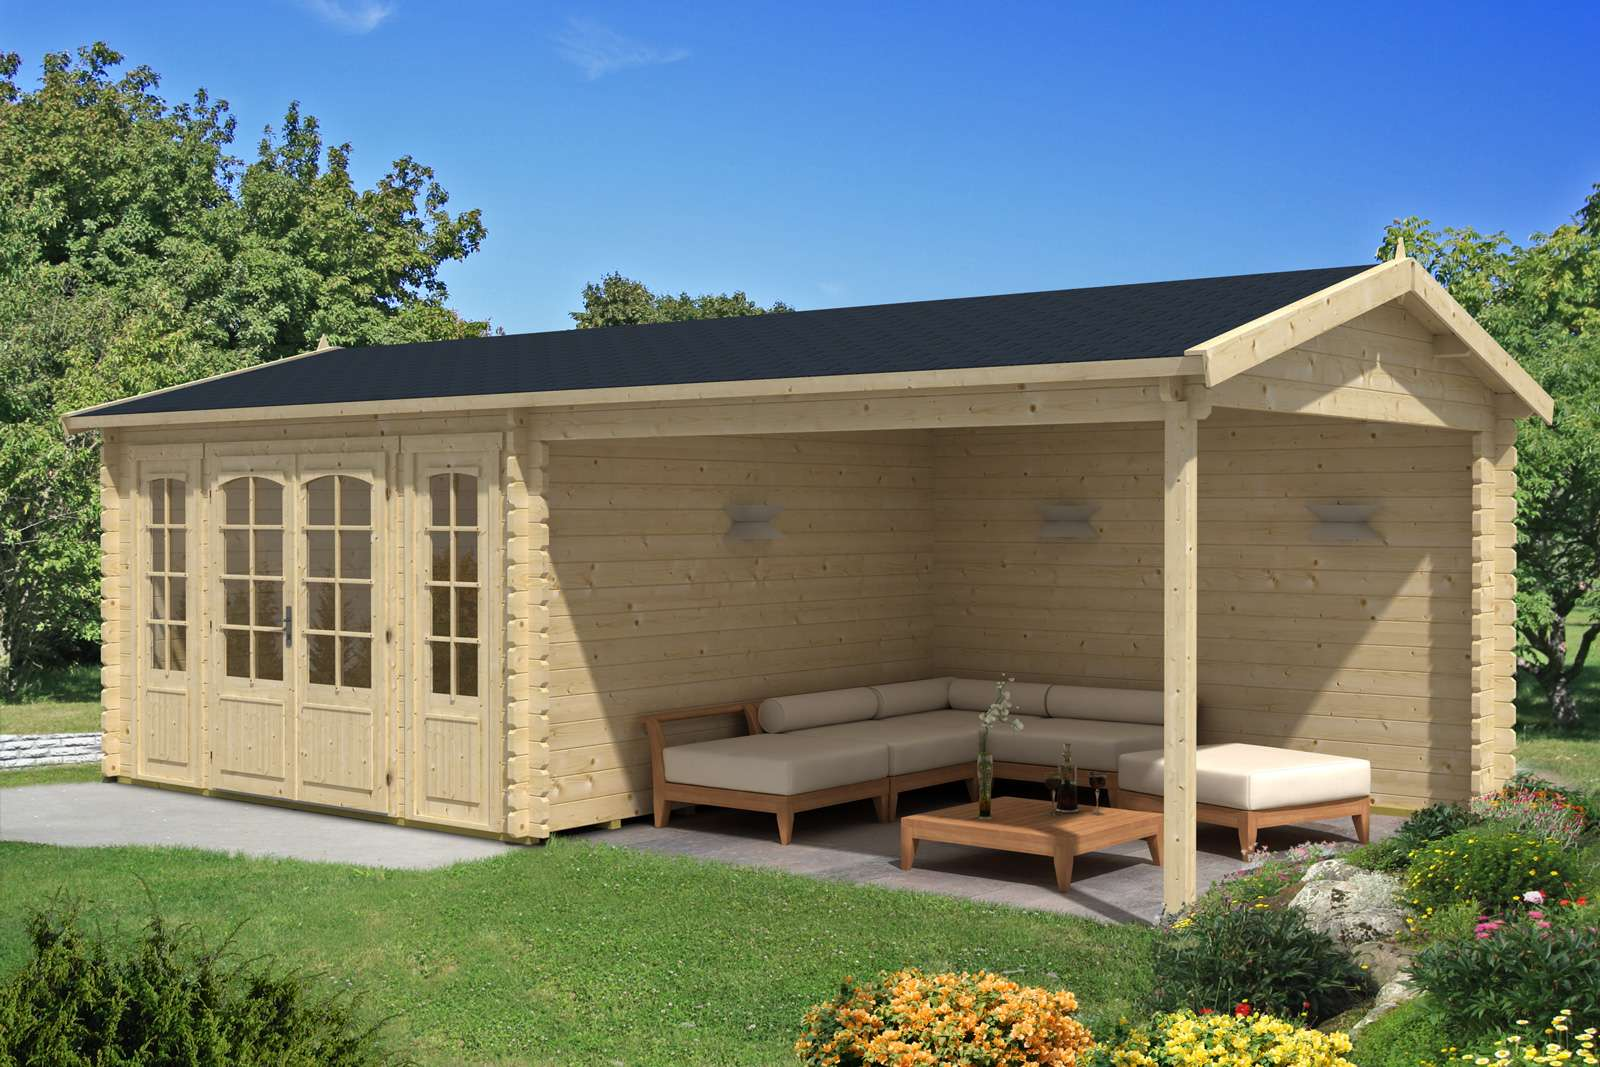 gartenhaus 12m2 my blog. Black Bedroom Furniture Sets. Home Design Ideas